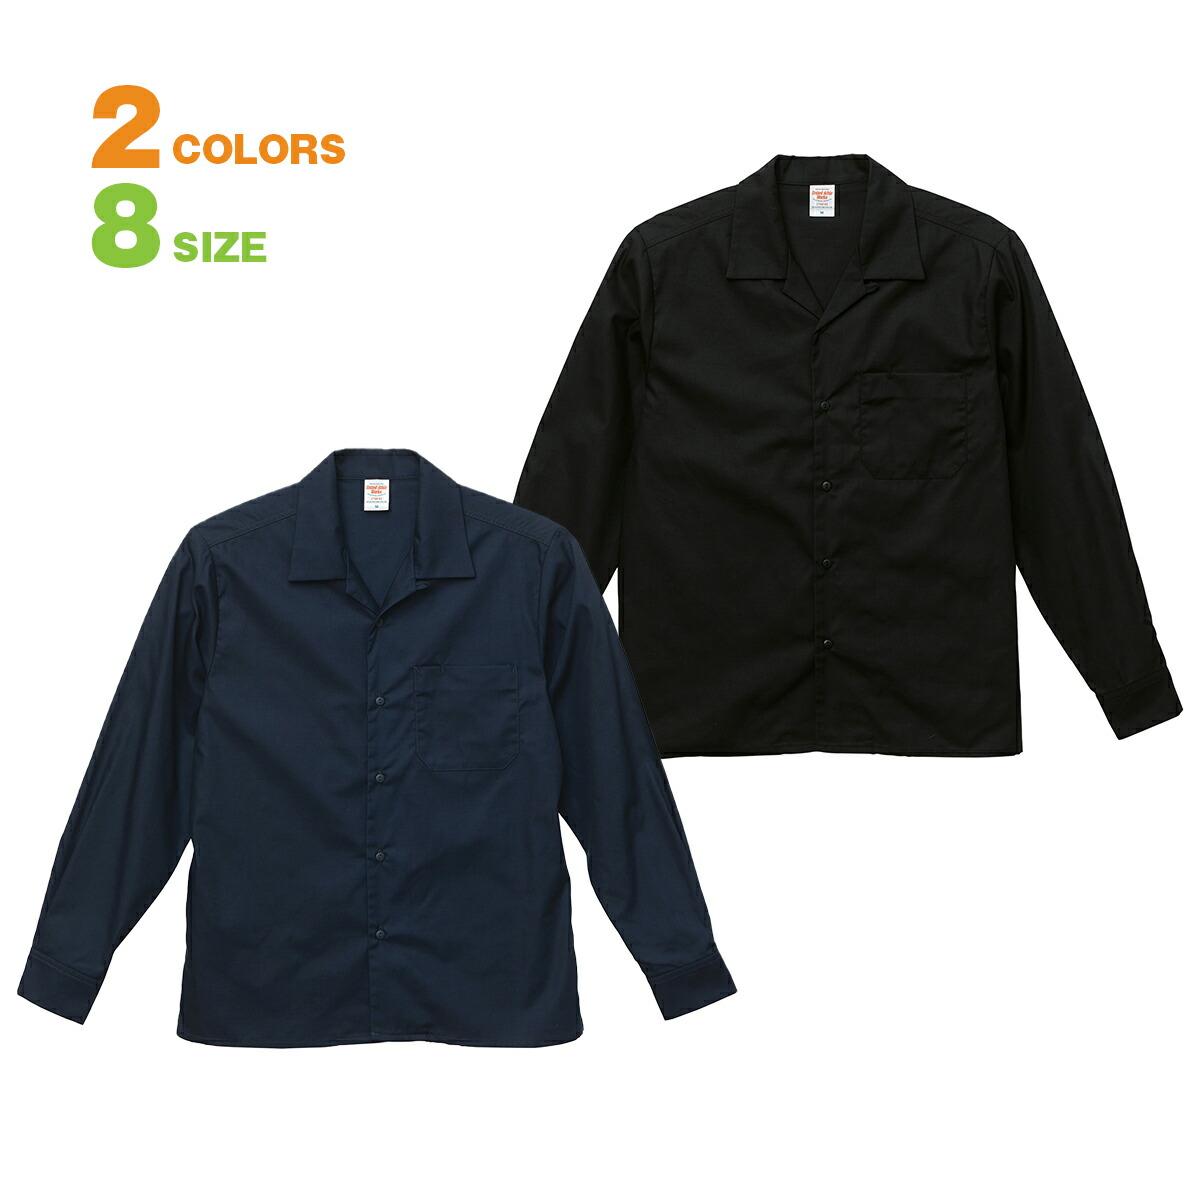 T/C オープンカラー ロングスリーブ シャツ